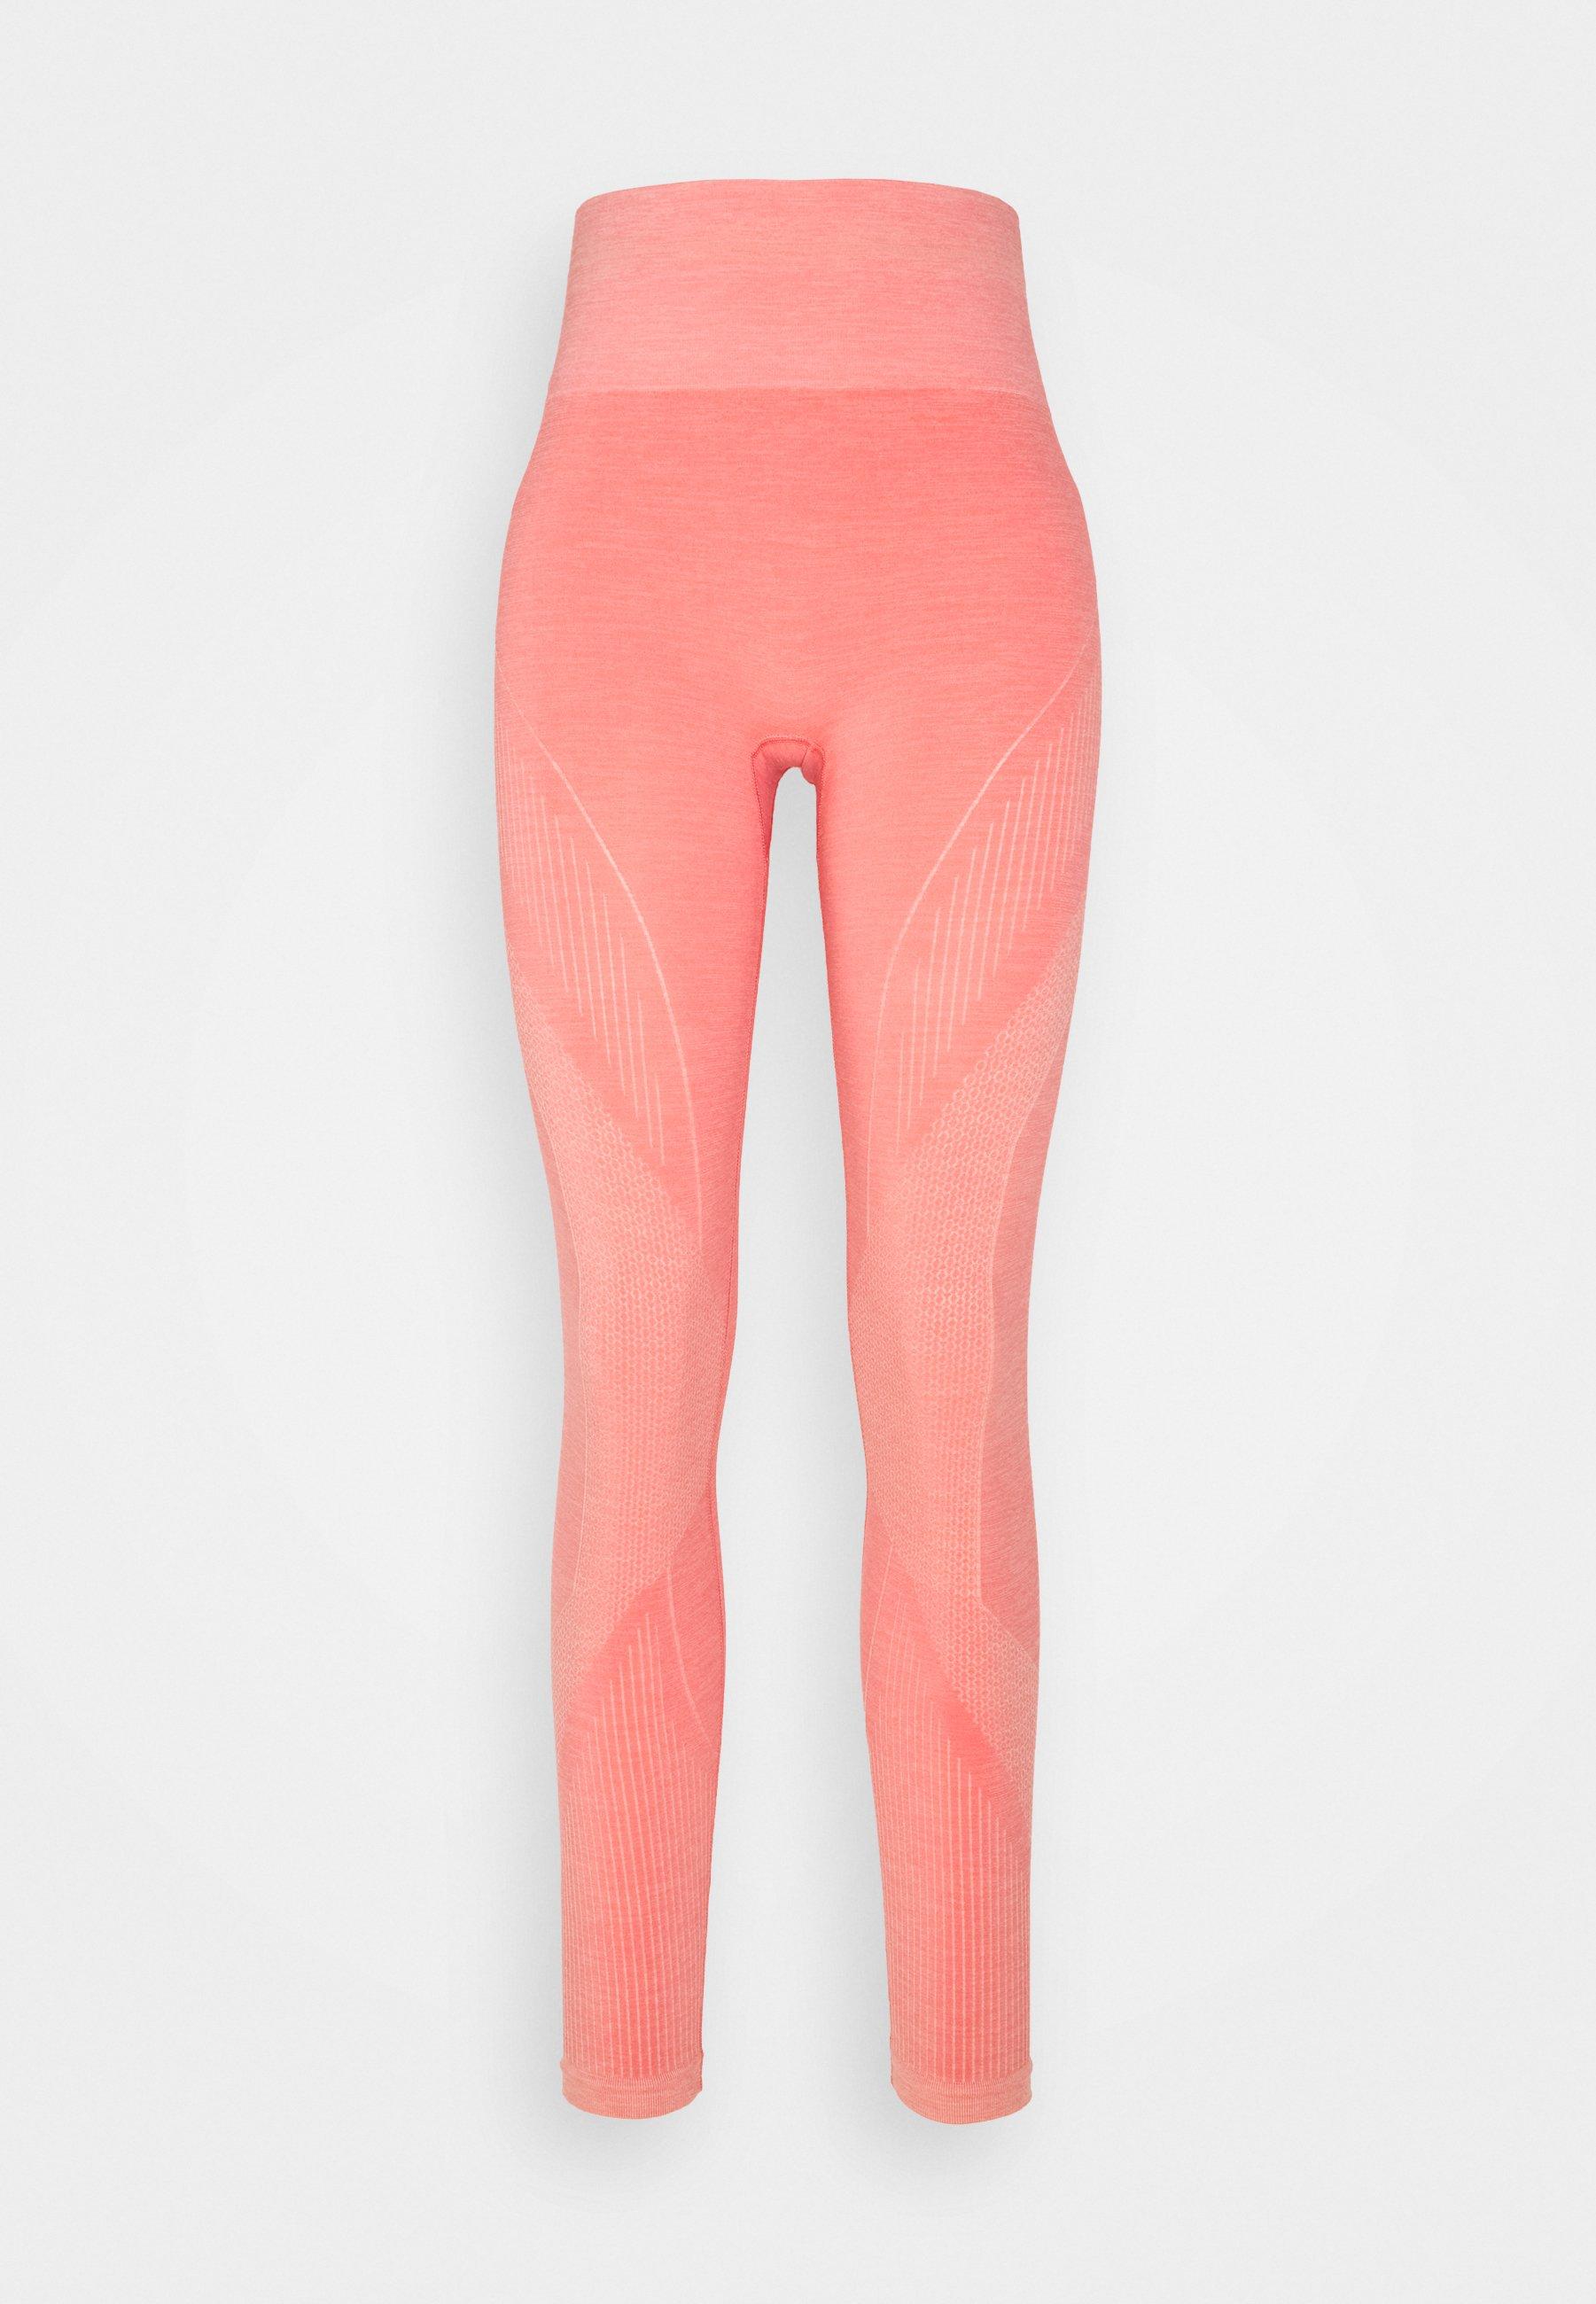 Femme HMLJOY SEAMLESS HIGH WAIST TIGHTS - Collants